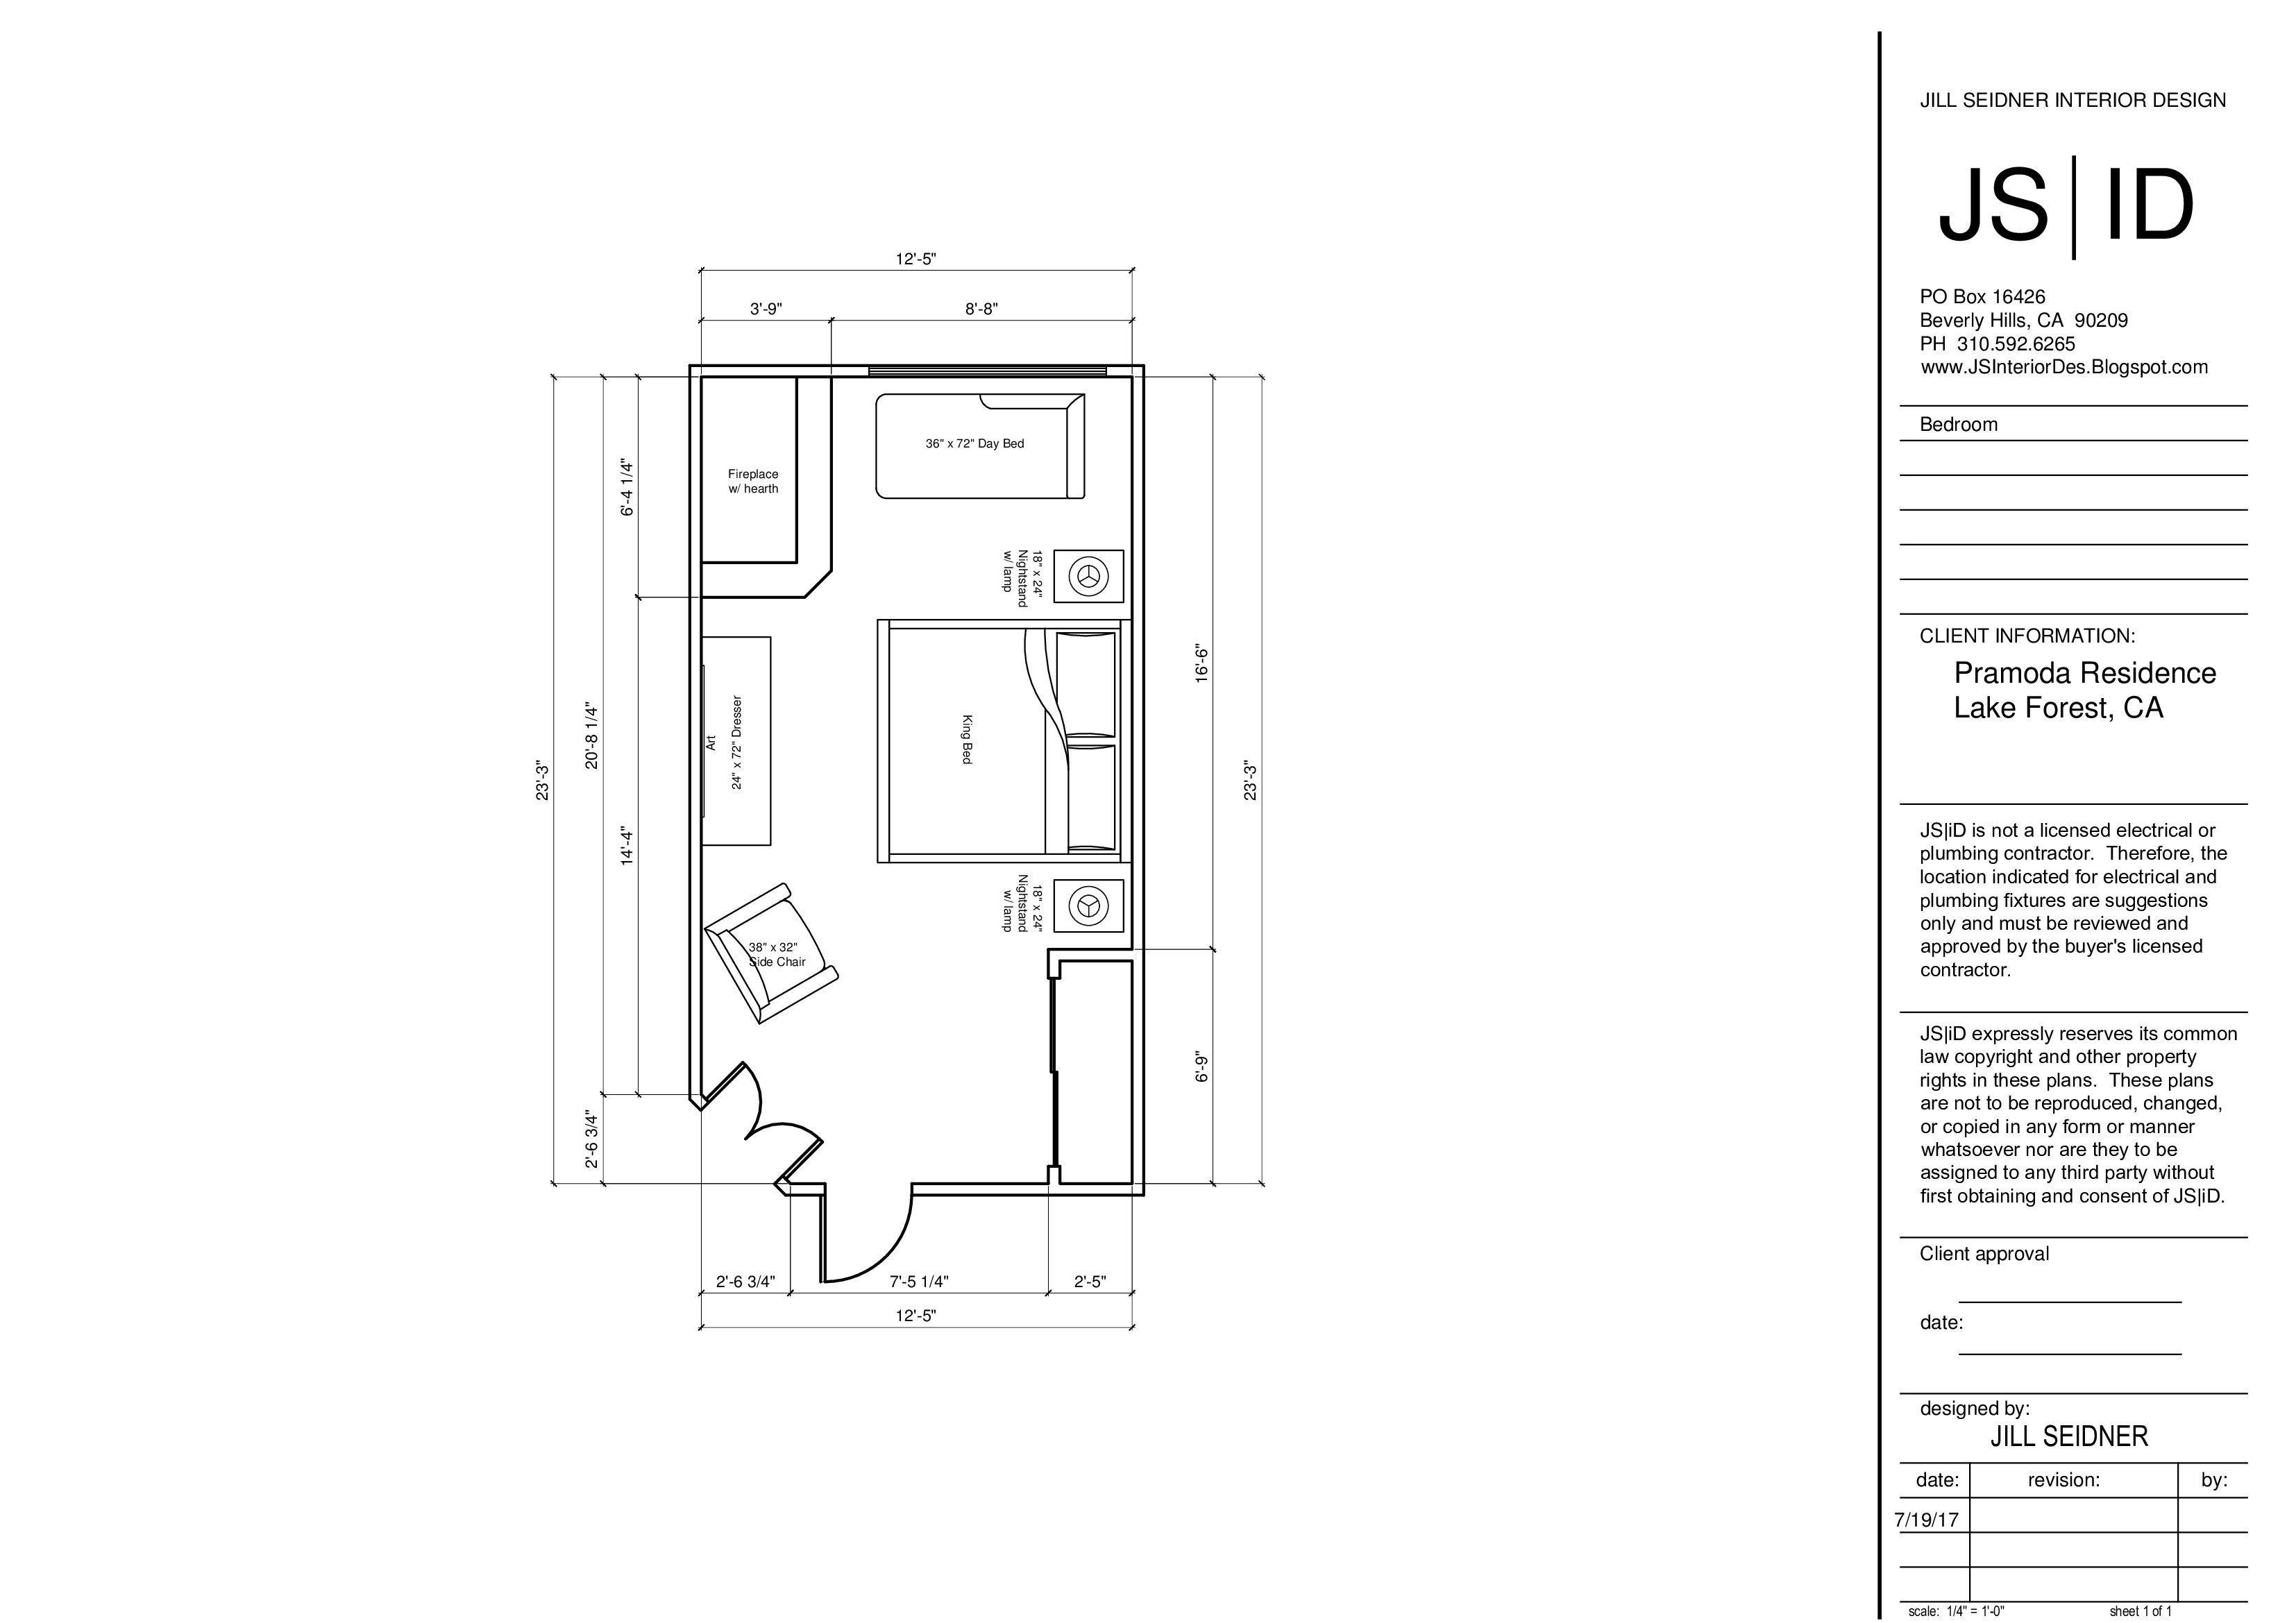 Lake Forest Ca Master Bedroom Furniture Floor Plan Layout Interiordesign Spaceplanning Interior Design Drawings Floor Plan Layout Master Bedroom Furniture